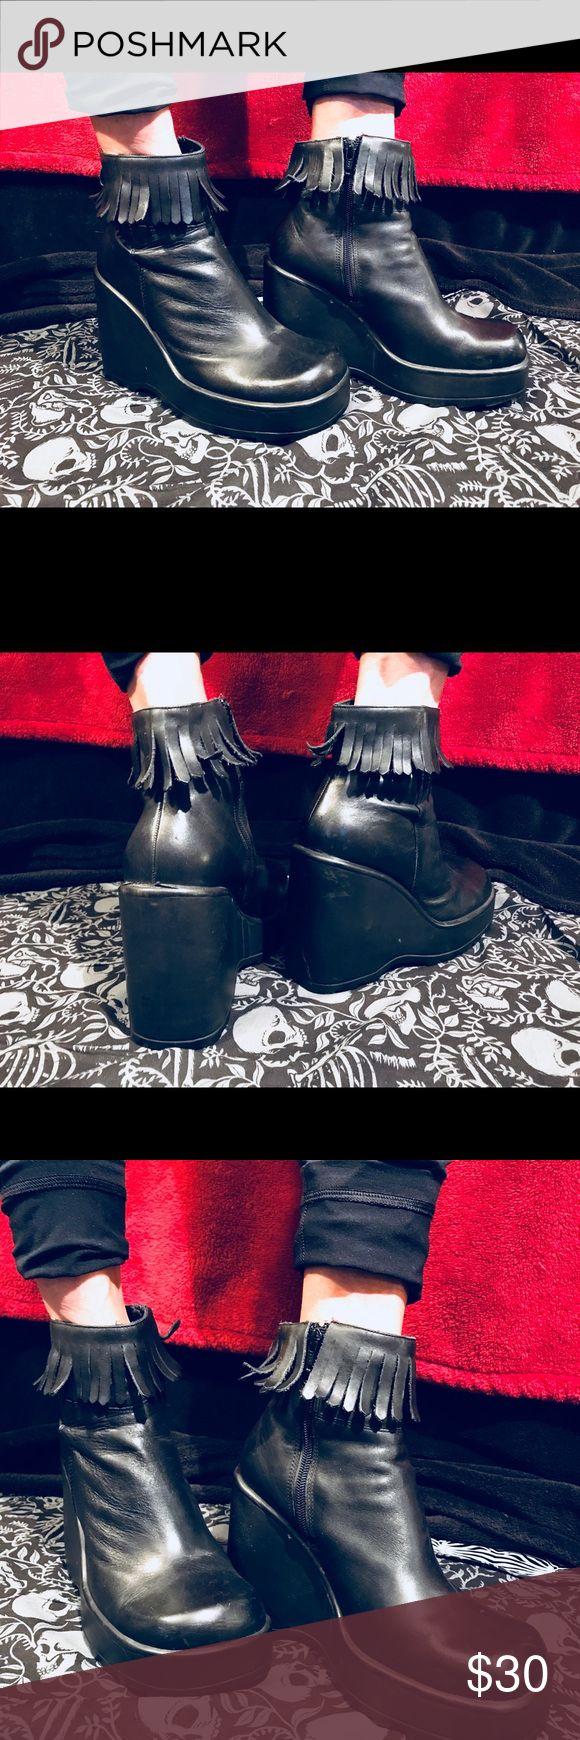 // Black Platform Wedge Booties // Size 9, high wedge platform heel, fringe around ankle, broken in but still fab. Arizona brand, ankle boots. Fake leather. Goth, punk, alternative. Shoes Platforms